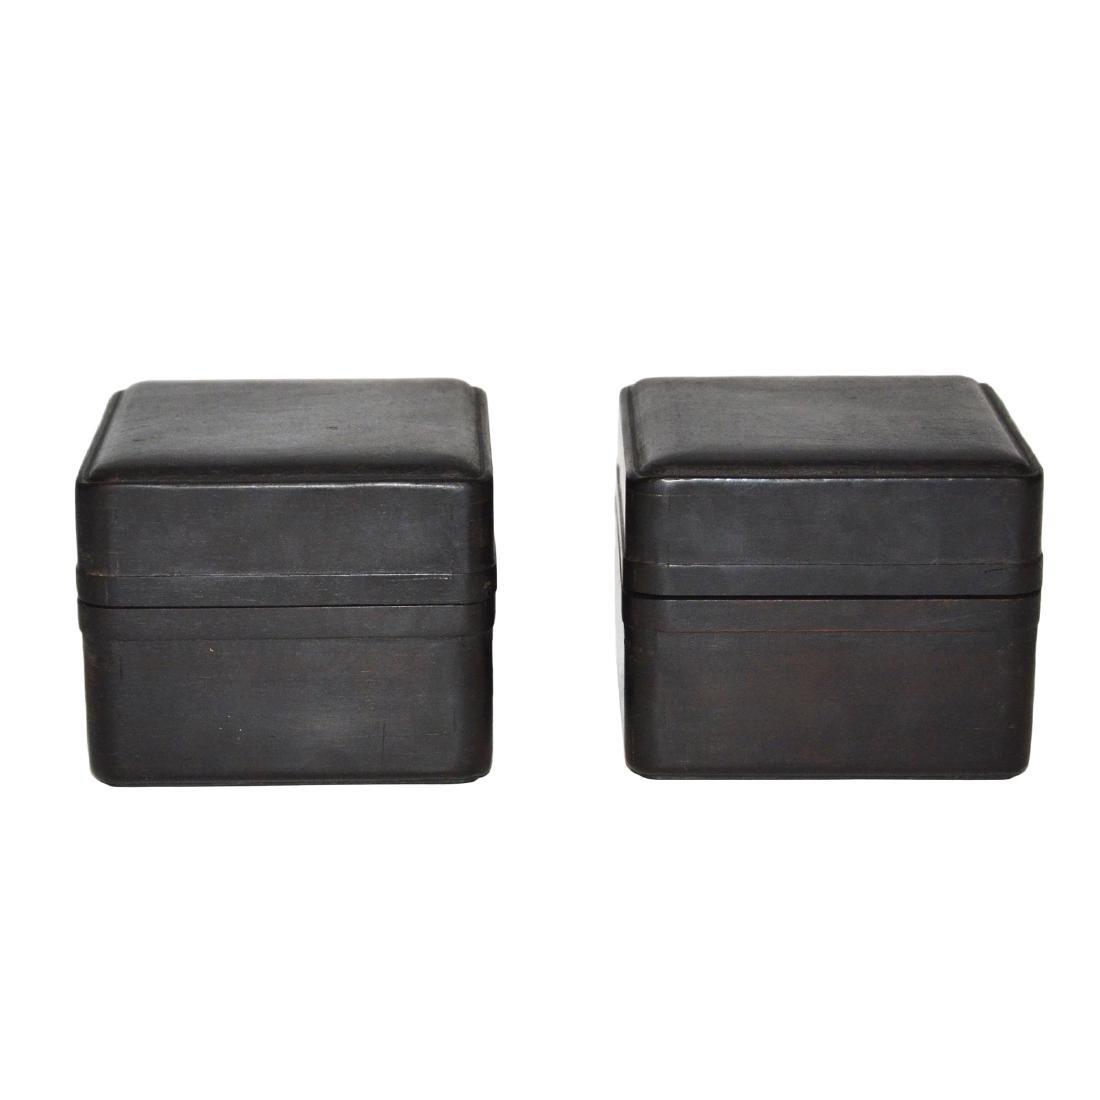 Qing, A Pair of Small Zitan Square Box - 2